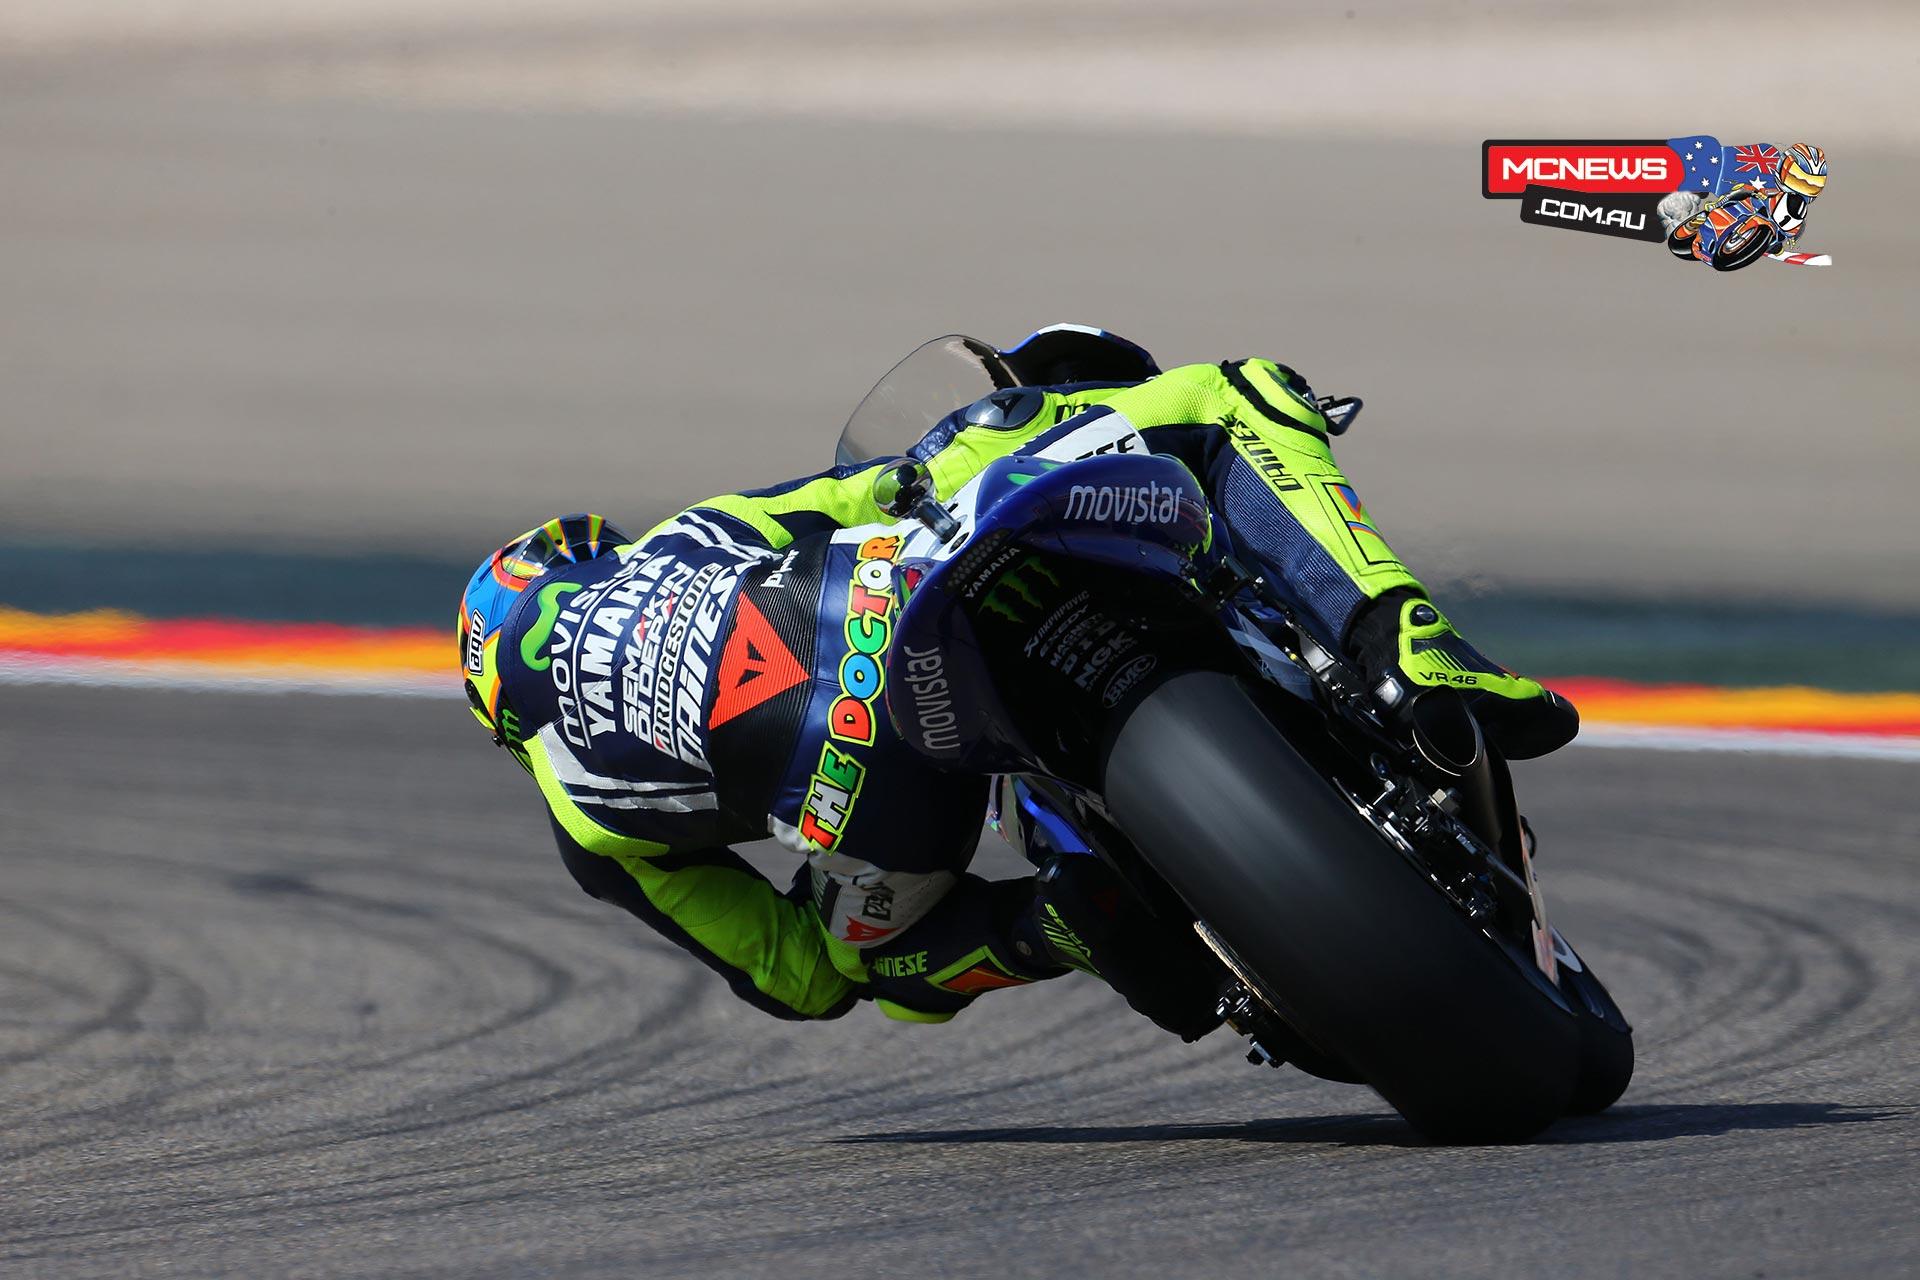 Rossi confirms all okay after crash | MCNews.com.au